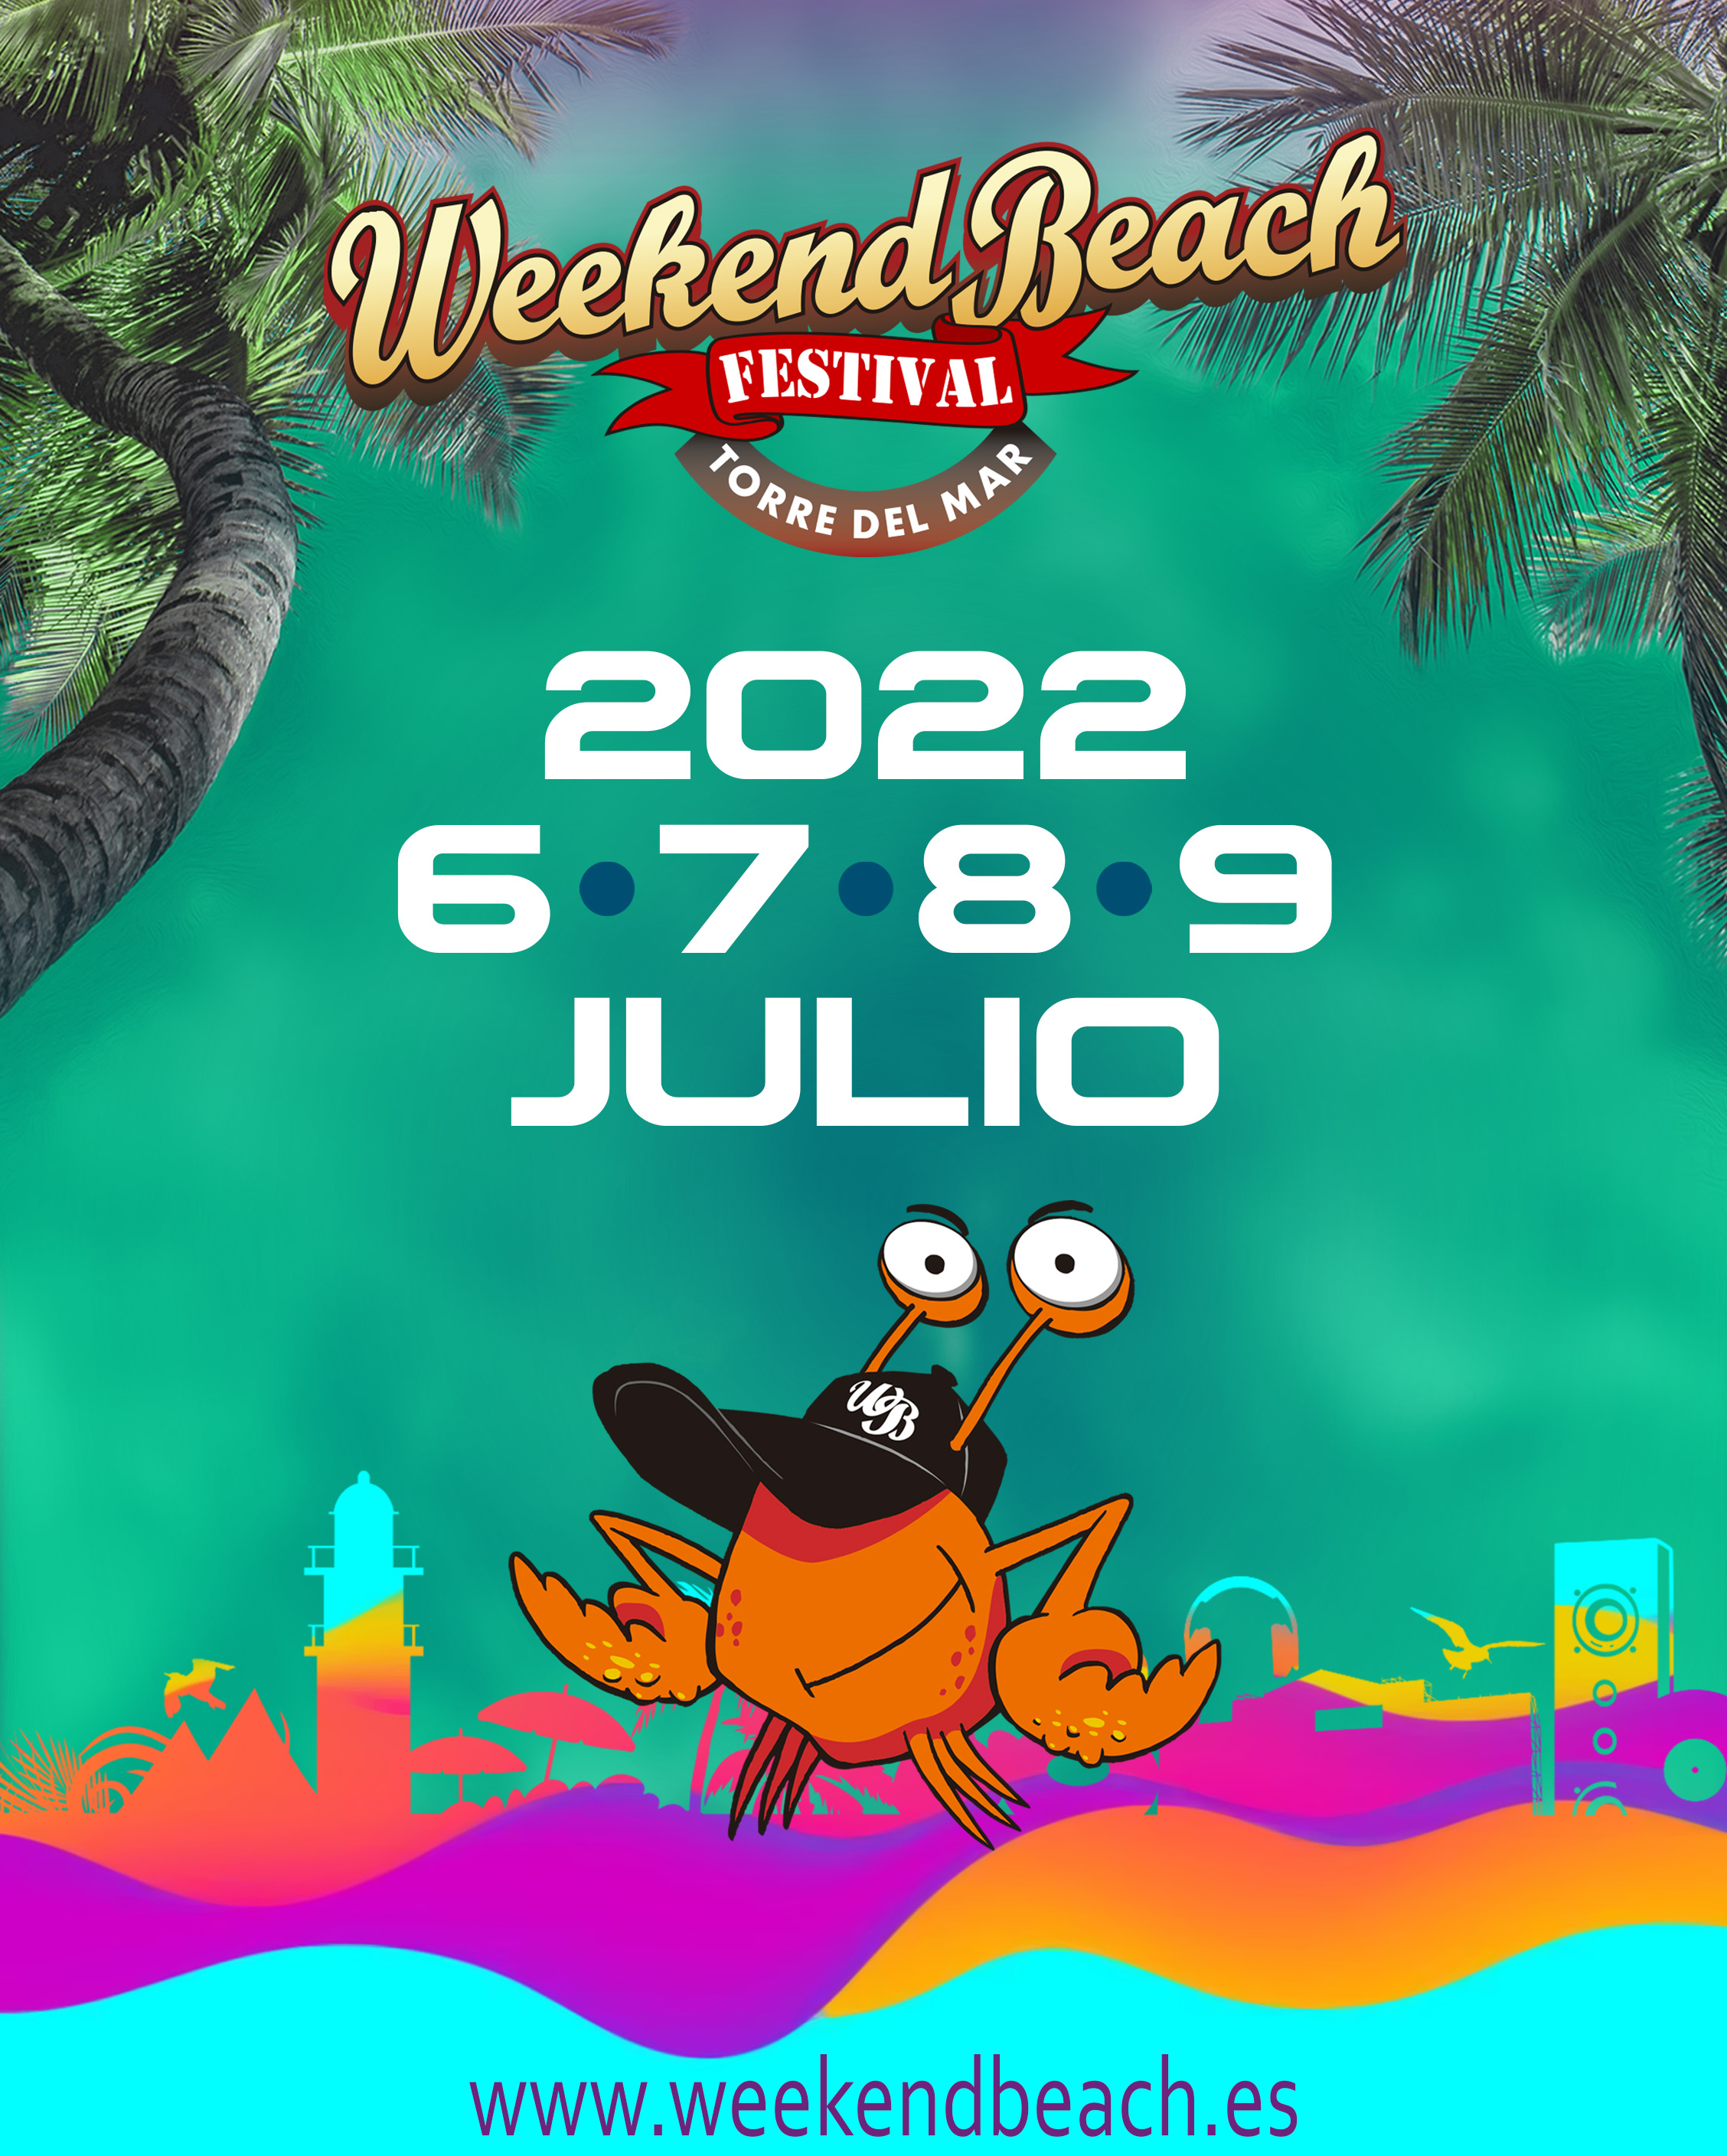 weekend-beach-torre-del-mar-2020-60b6072d83a97.jpeg